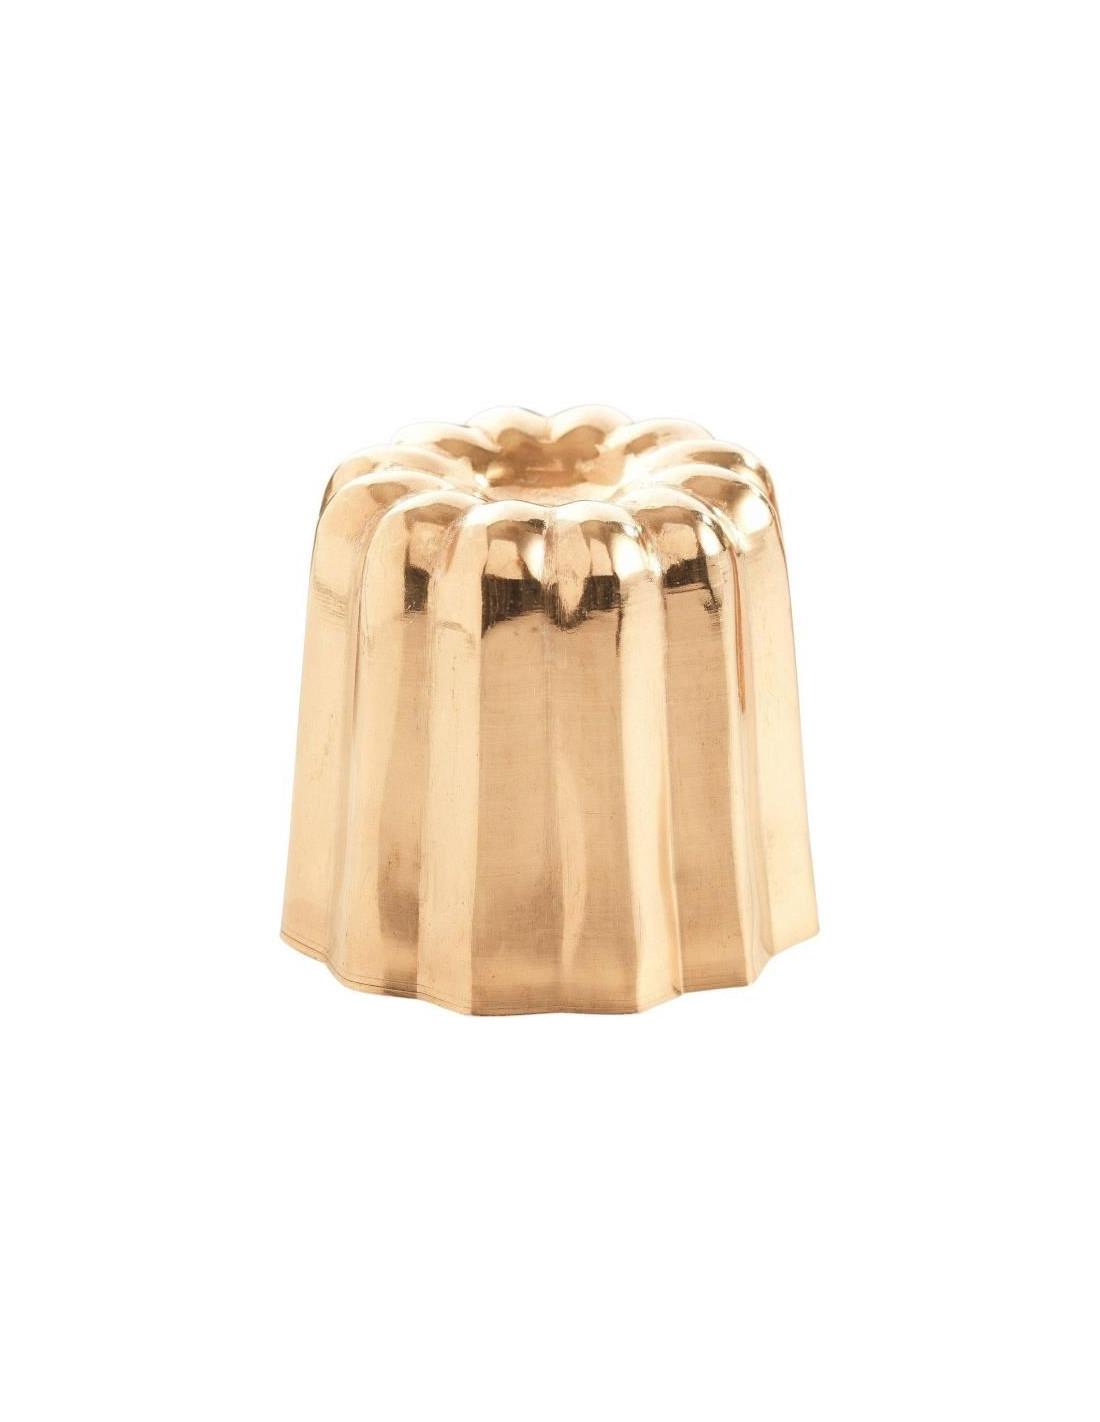 patisse 6 moules a cannel s en cuivre 35 mm. Black Bedroom Furniture Sets. Home Design Ideas